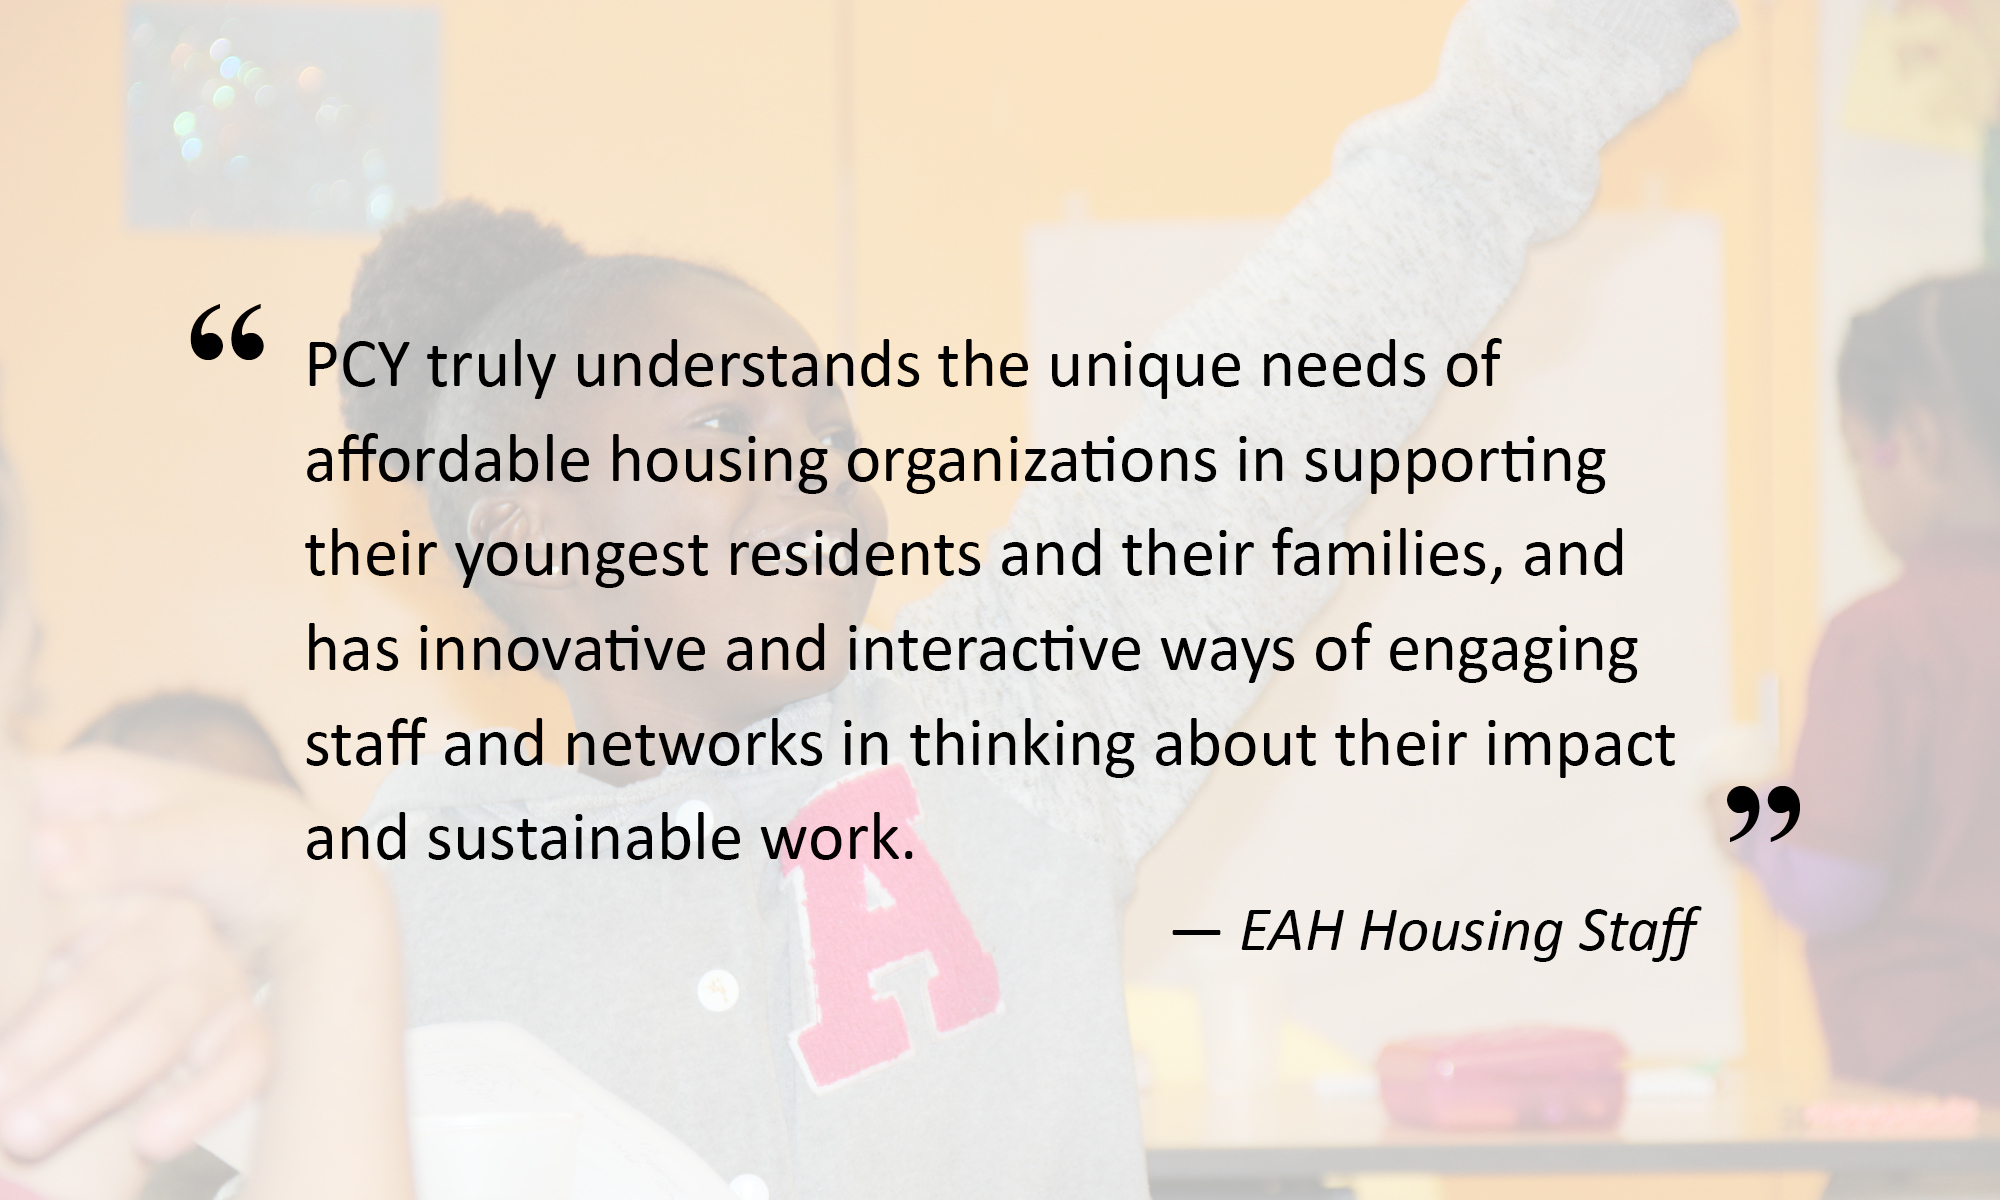 Housing_Education_quote_3.jpg